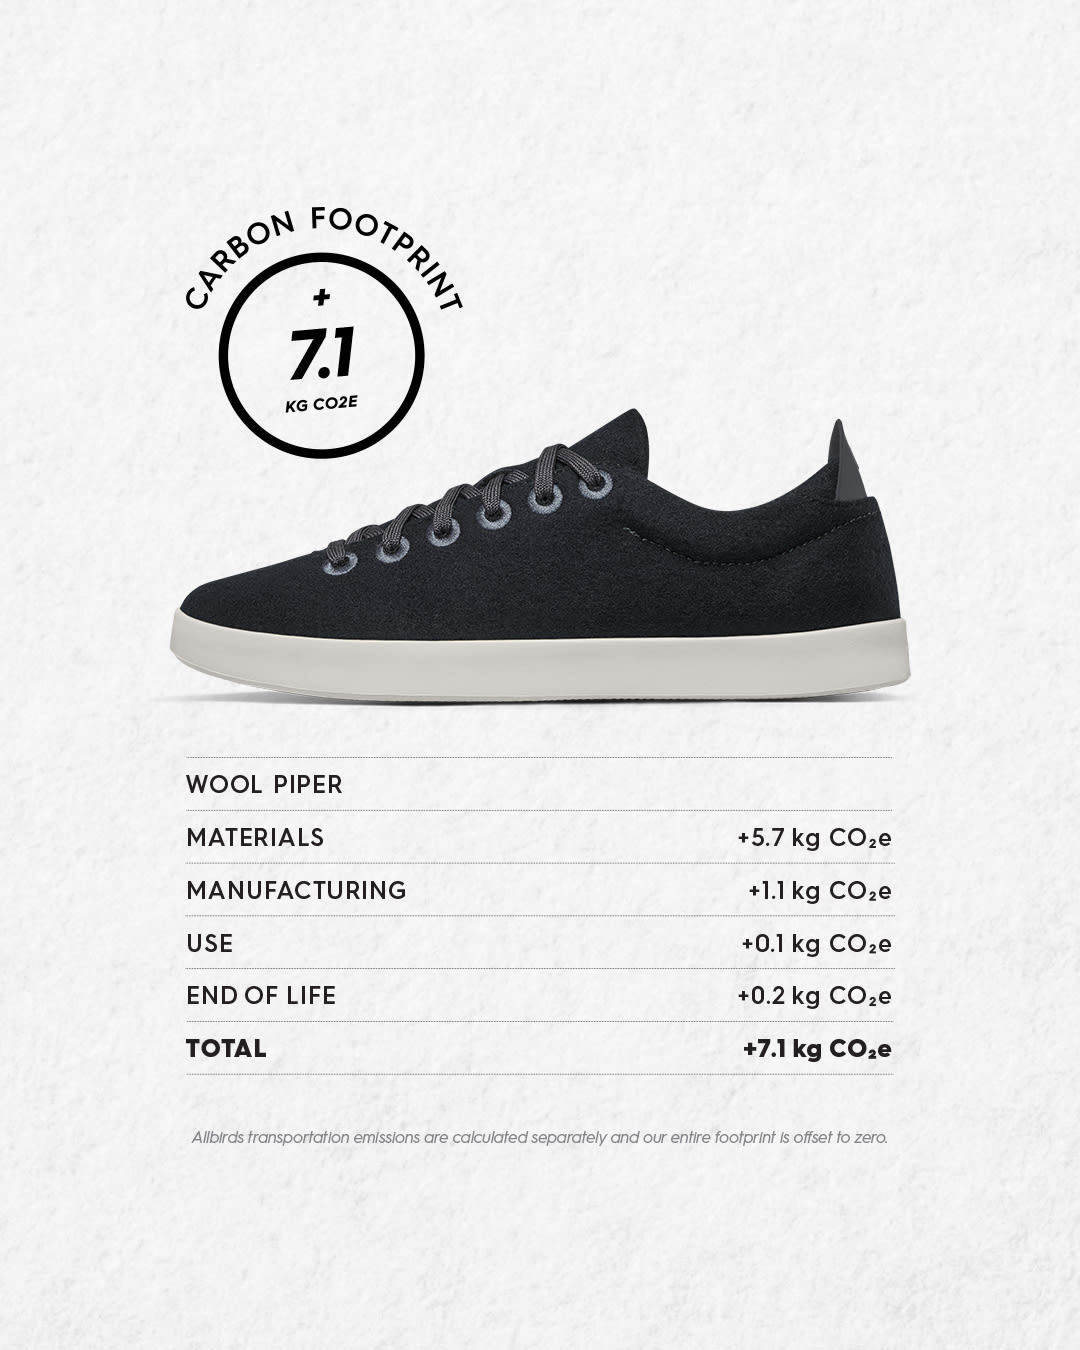 understand shoes' carbon footprint